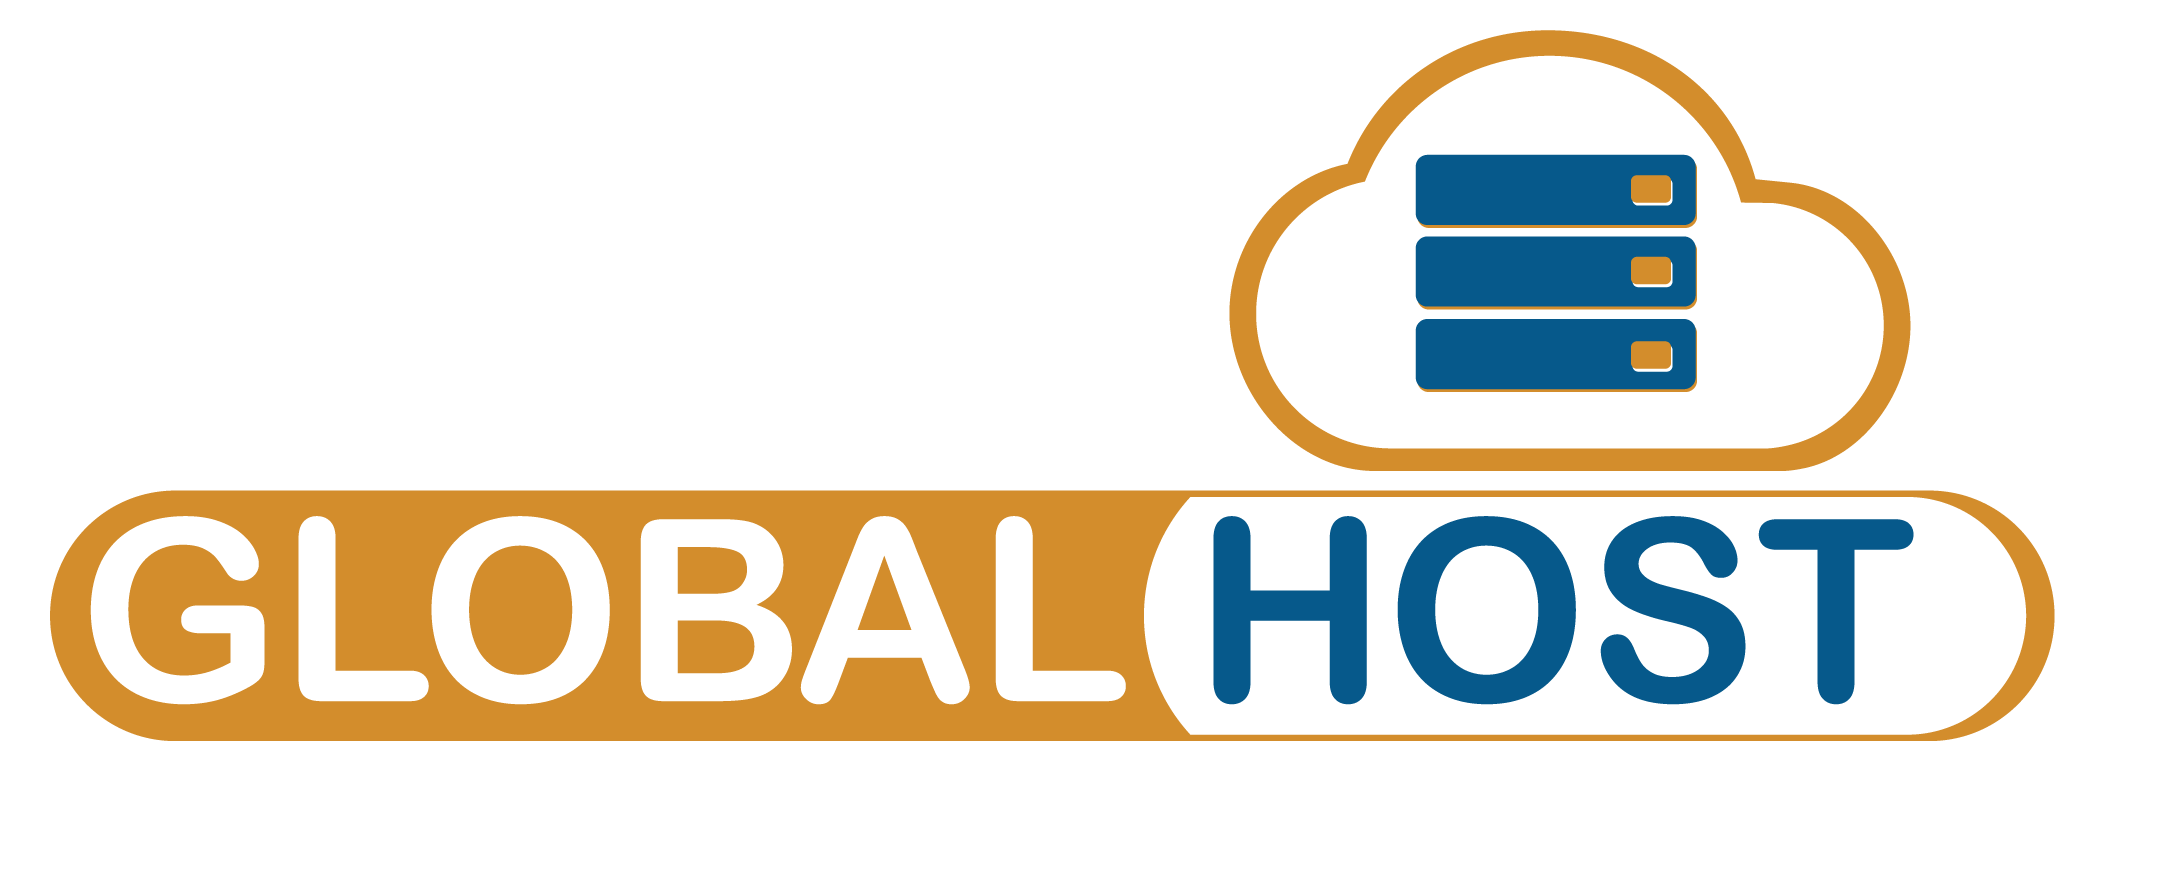 SSD Web Hosting - GLOBAL HOST INC.